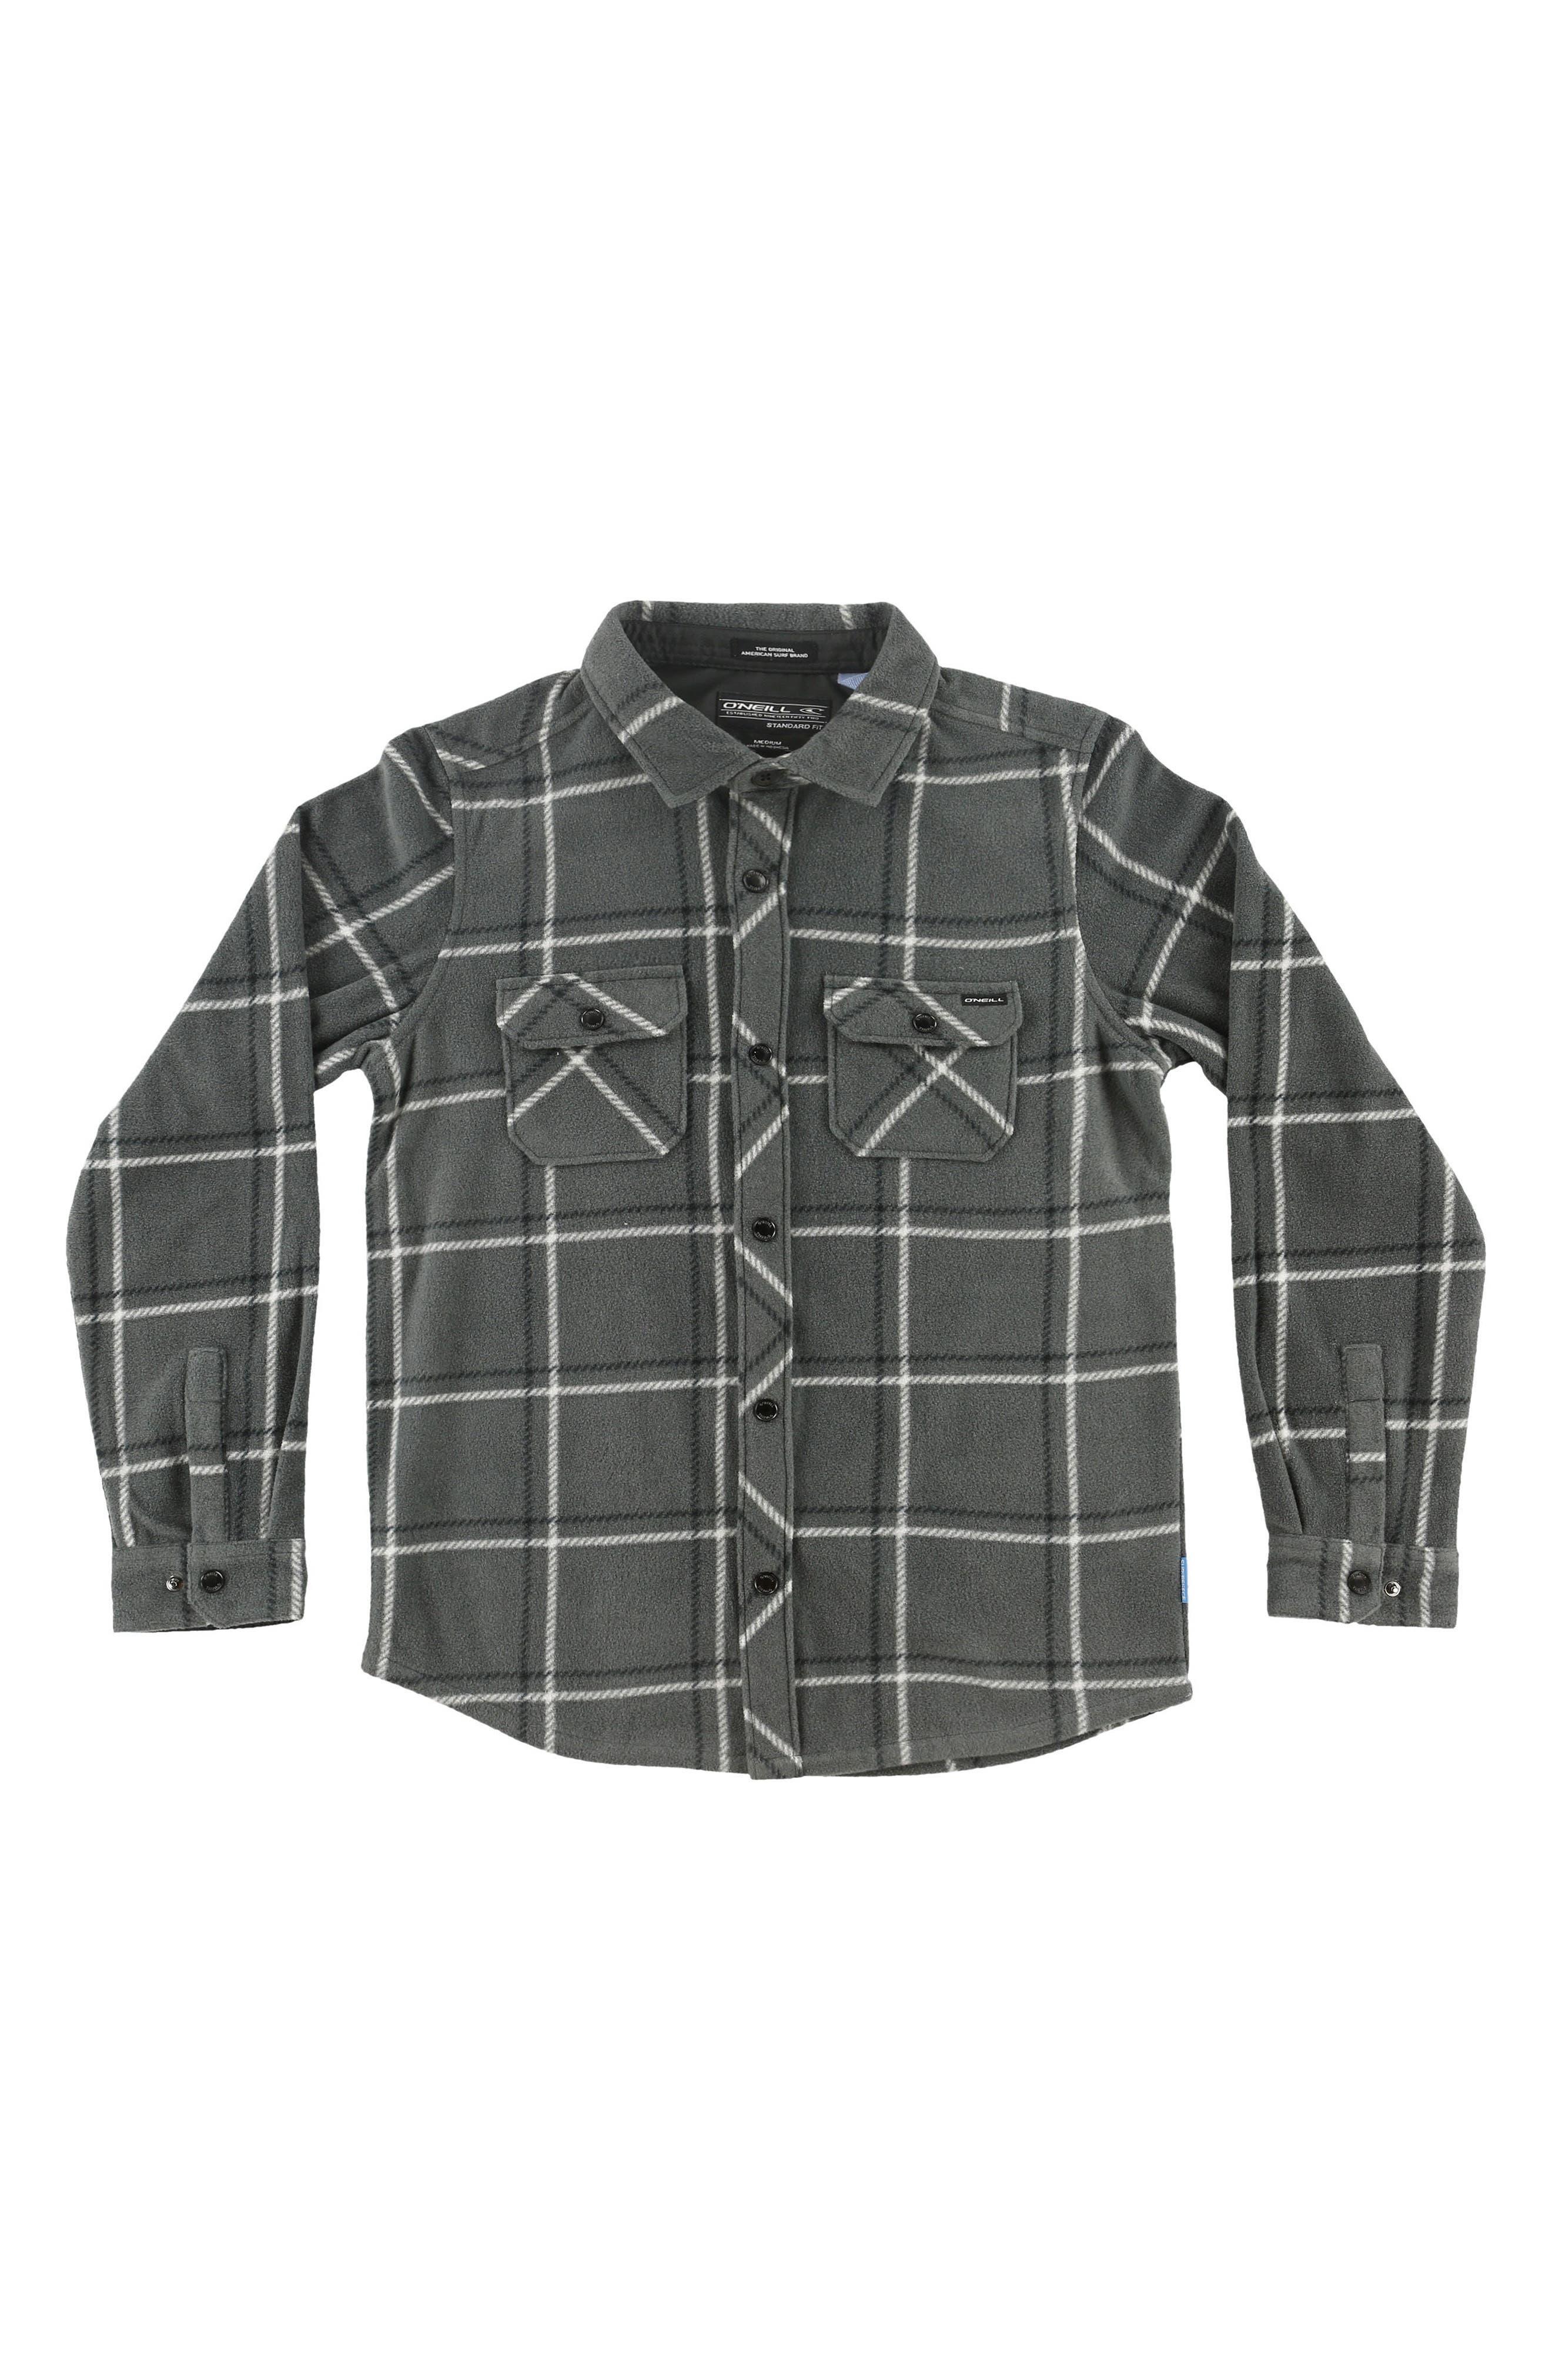 O'Neill Glacier Series Two Plush Windowpane Shirt (Toddler Boys)